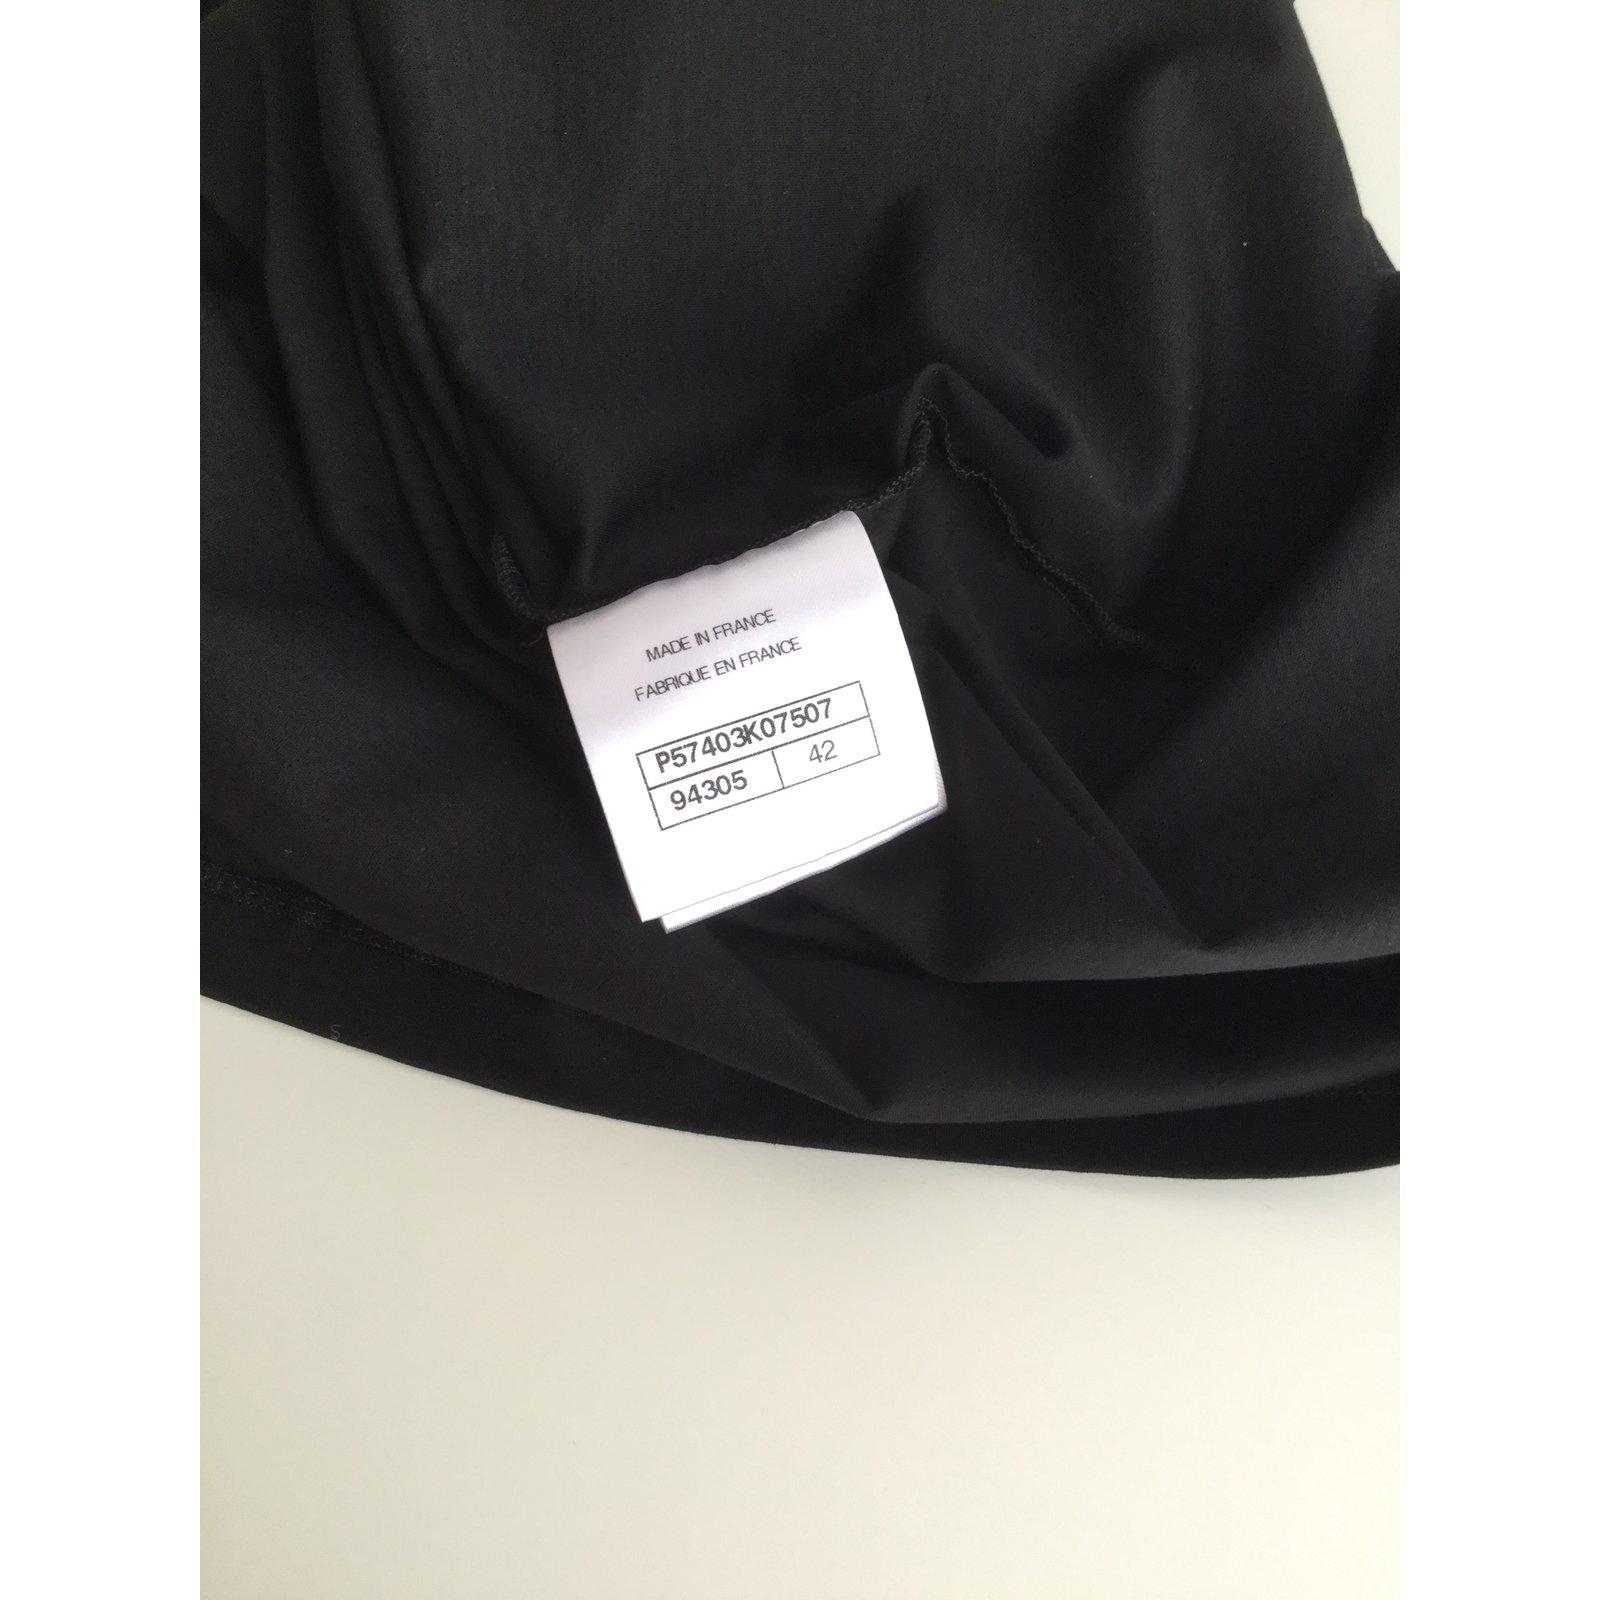 3943f490fc9dba Chanel Tops Tops Cotton Black ref.74969 - Joli Closet